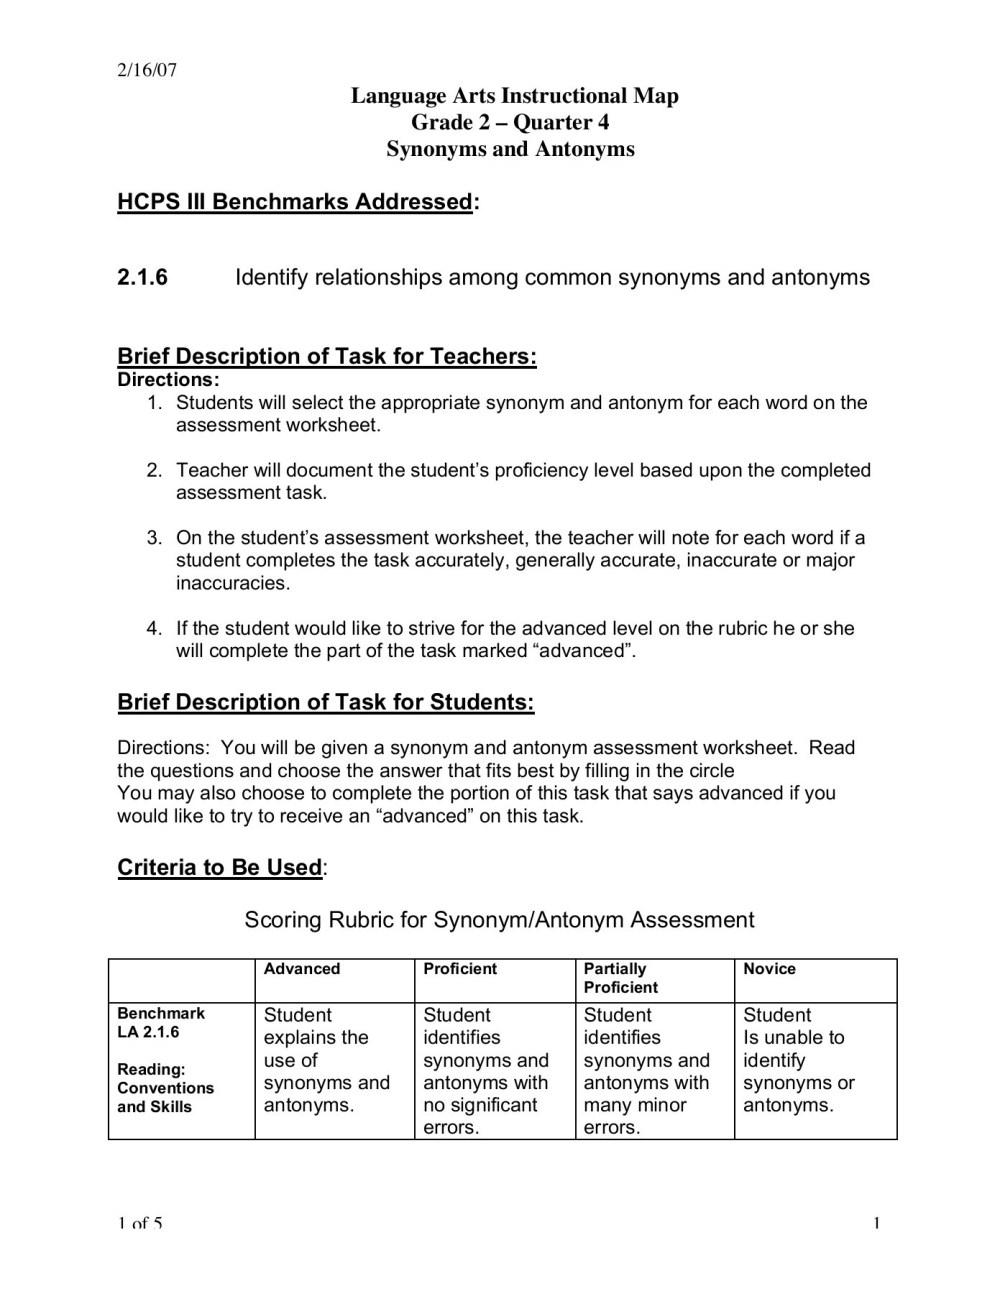 medium resolution of 2/16/07 Language Arts Instructional Map Grade 2 ... Pages 1 - 5 - Flip PDF  Download   FlipHTML5